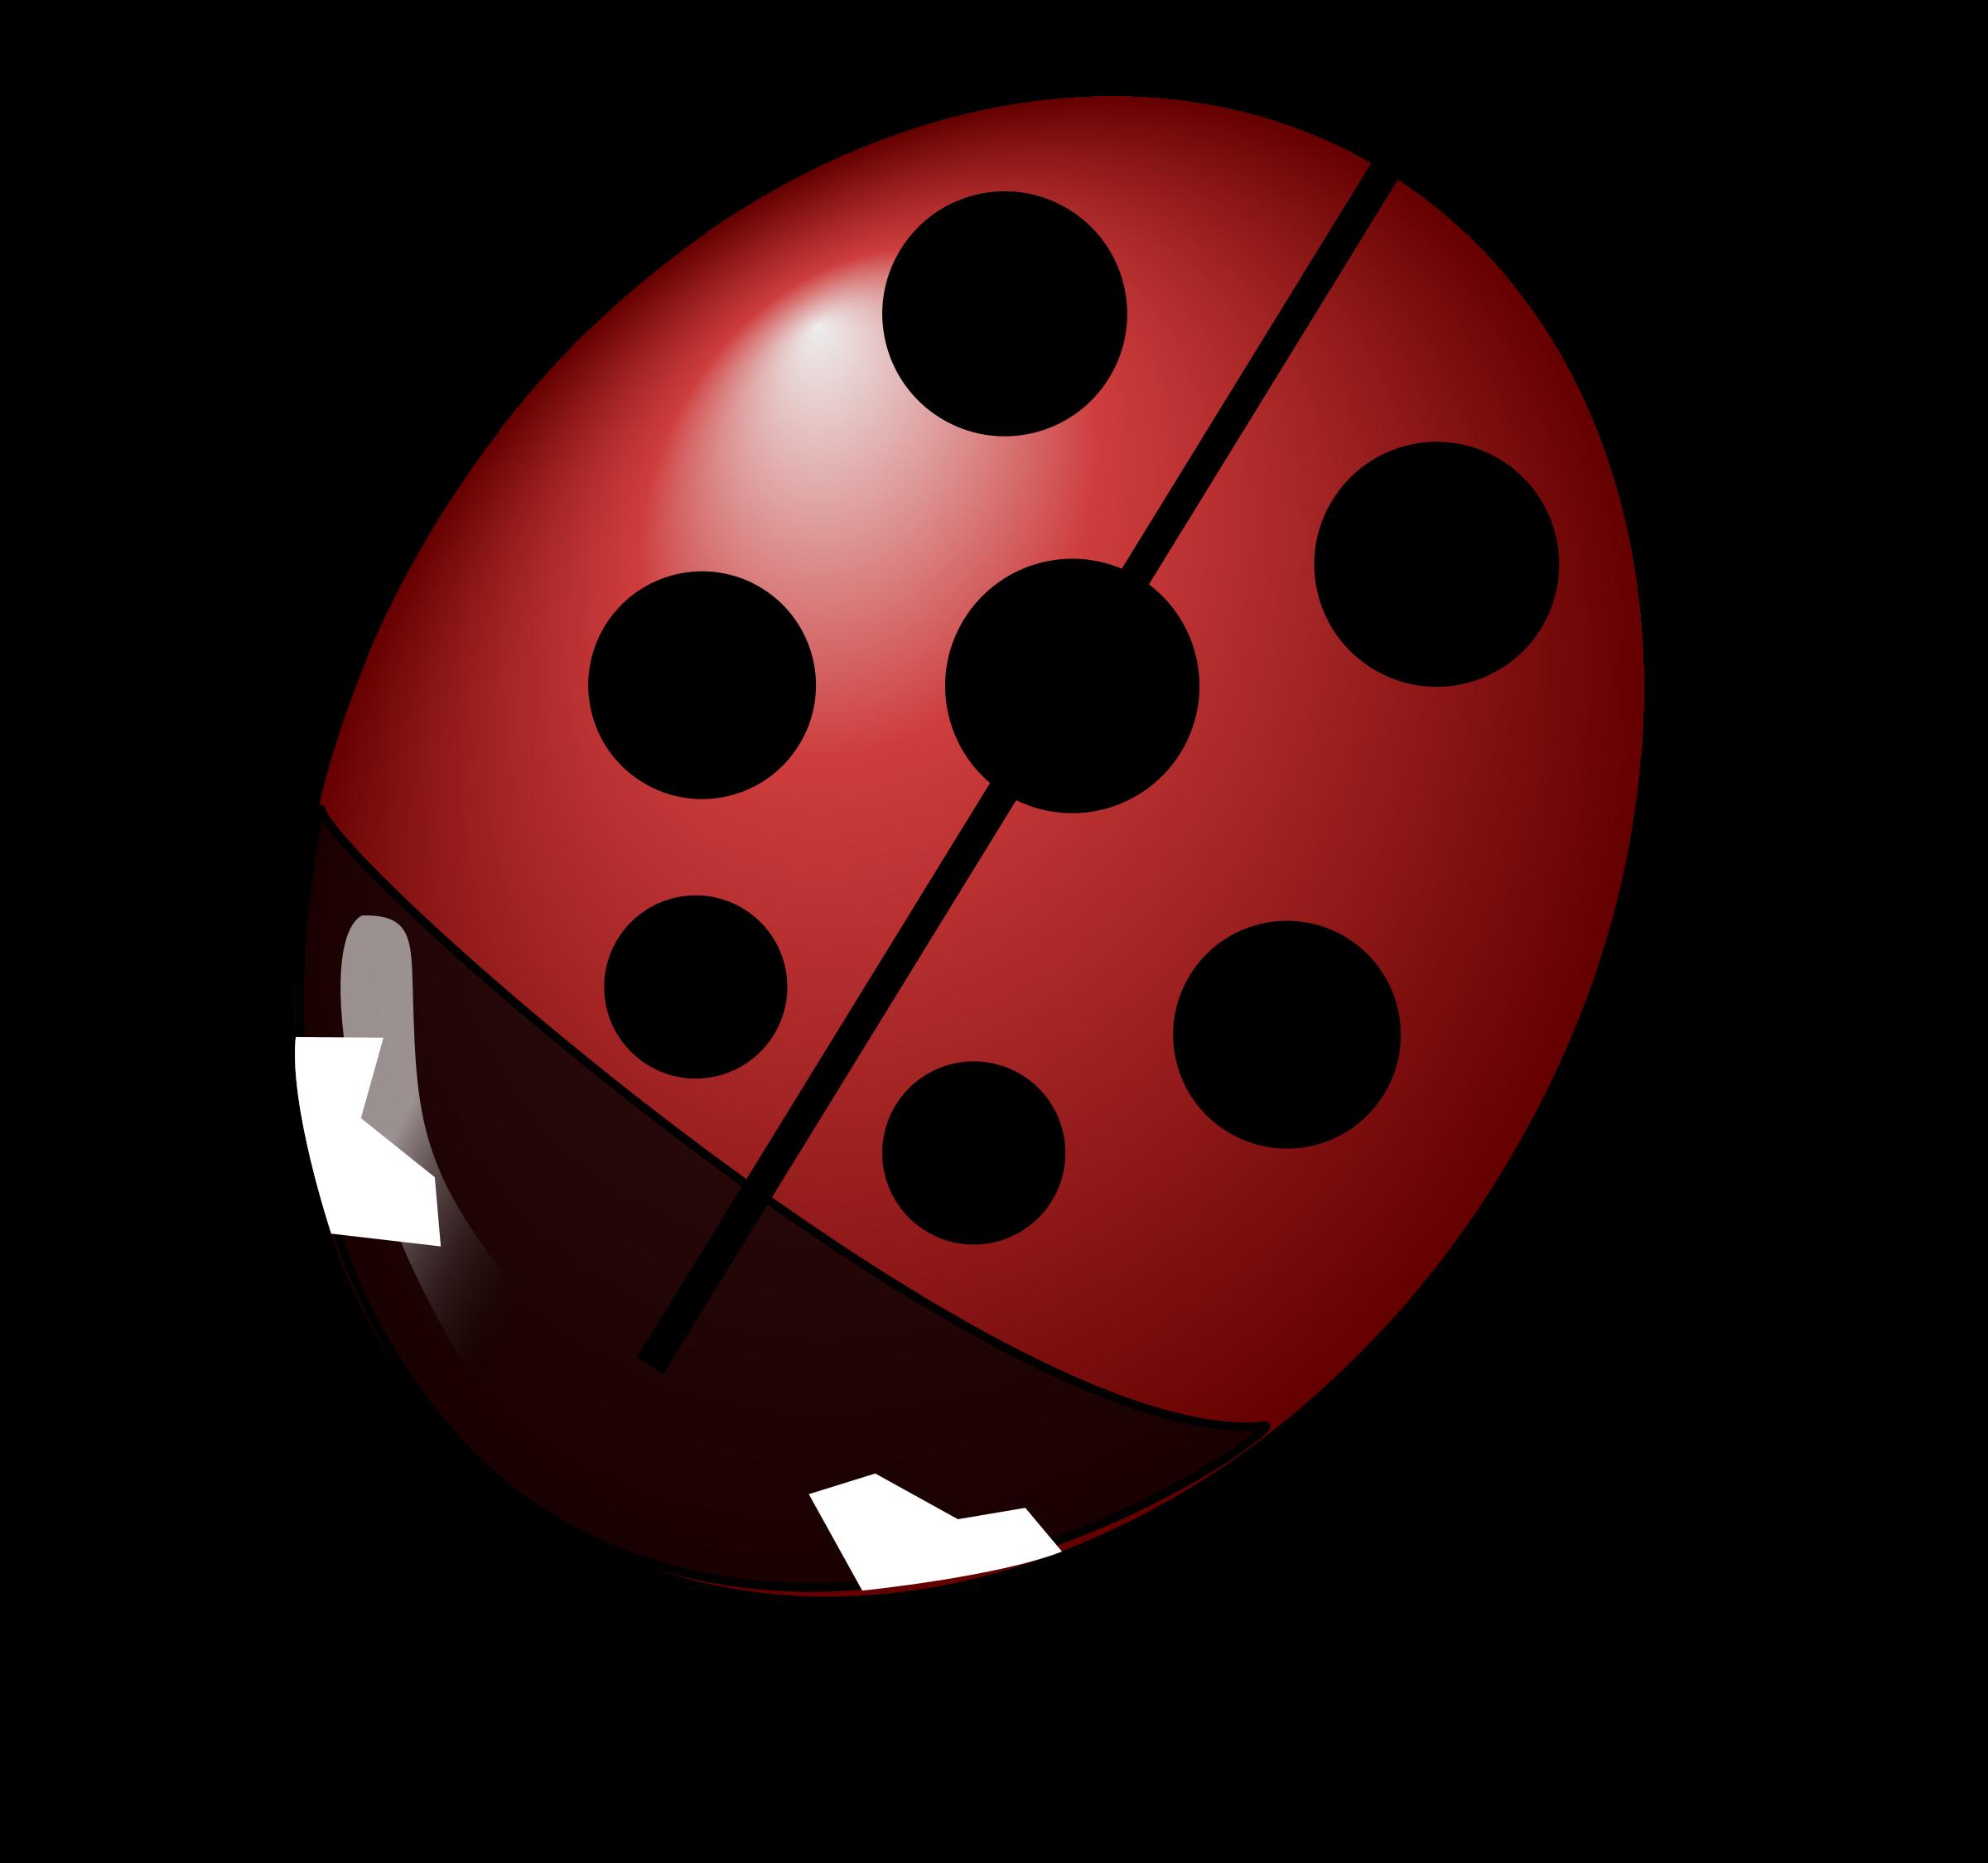 Ladybugs clipart l be for. Ladybug big image png